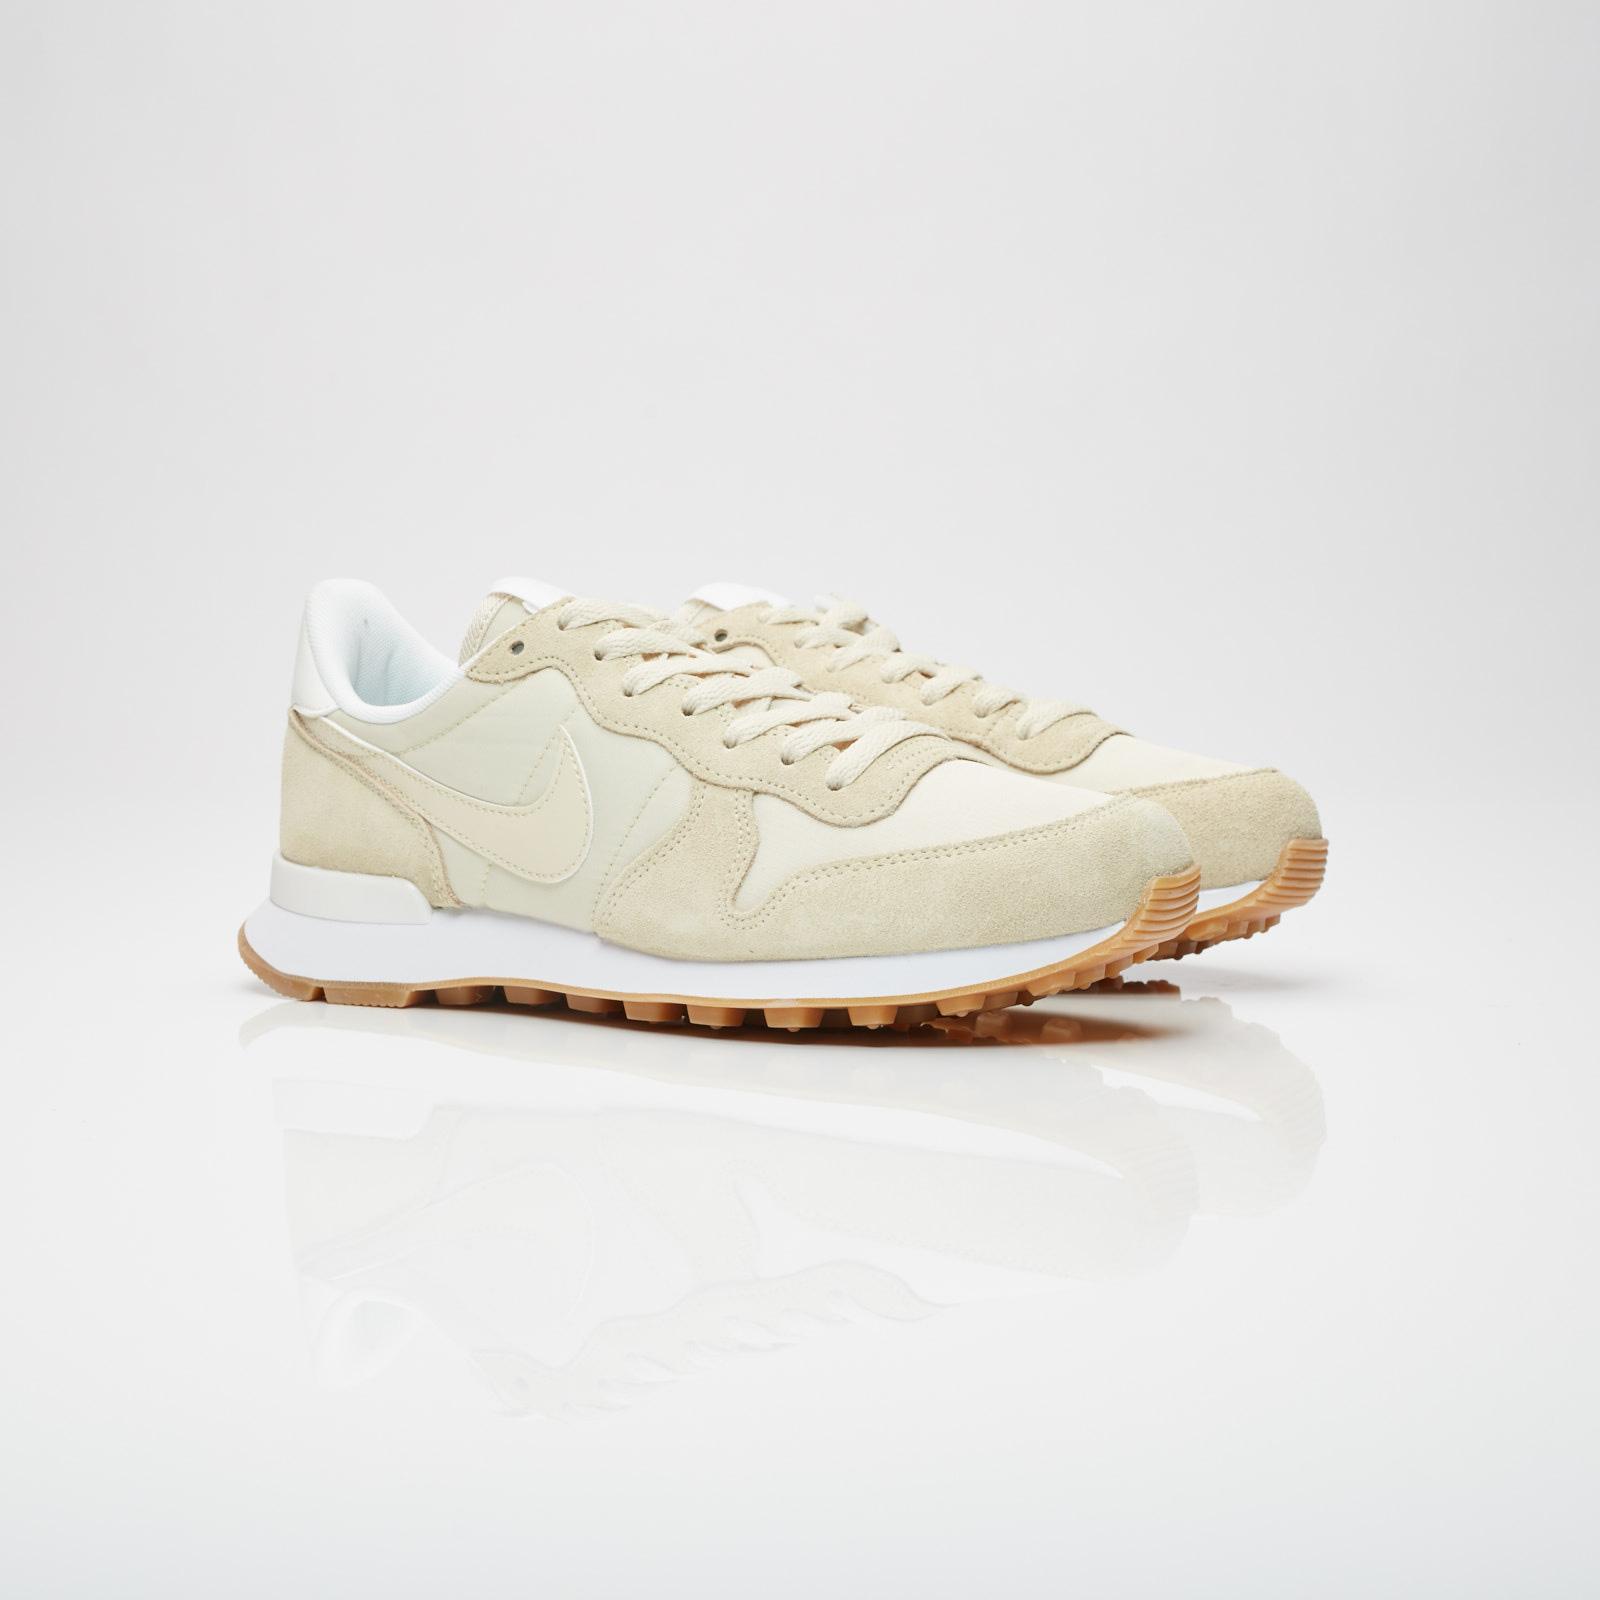 4827cc44cf13 Nike Wmns Internationalist - 828407-206 - Sneakersnstuff